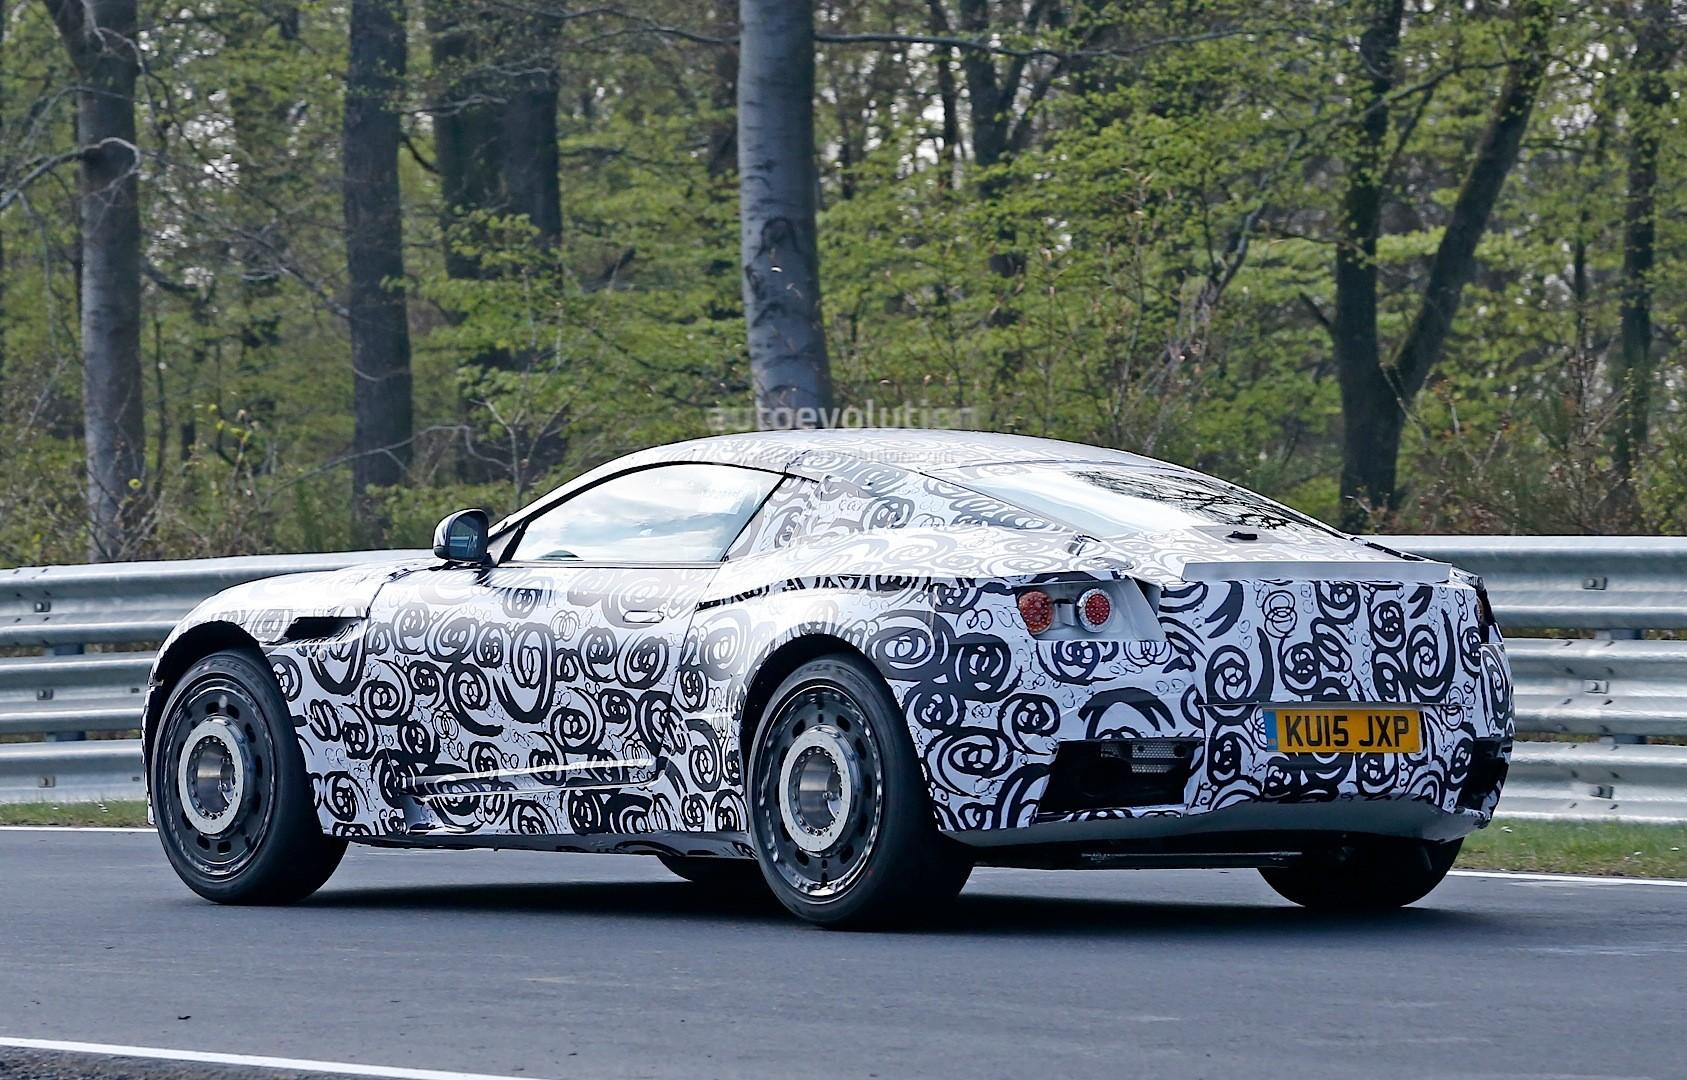 2016 - [Aston Martin] DB11 Spyshots-aston-martin-db11-prototype-seen-testing-at-the-nurburgring_7